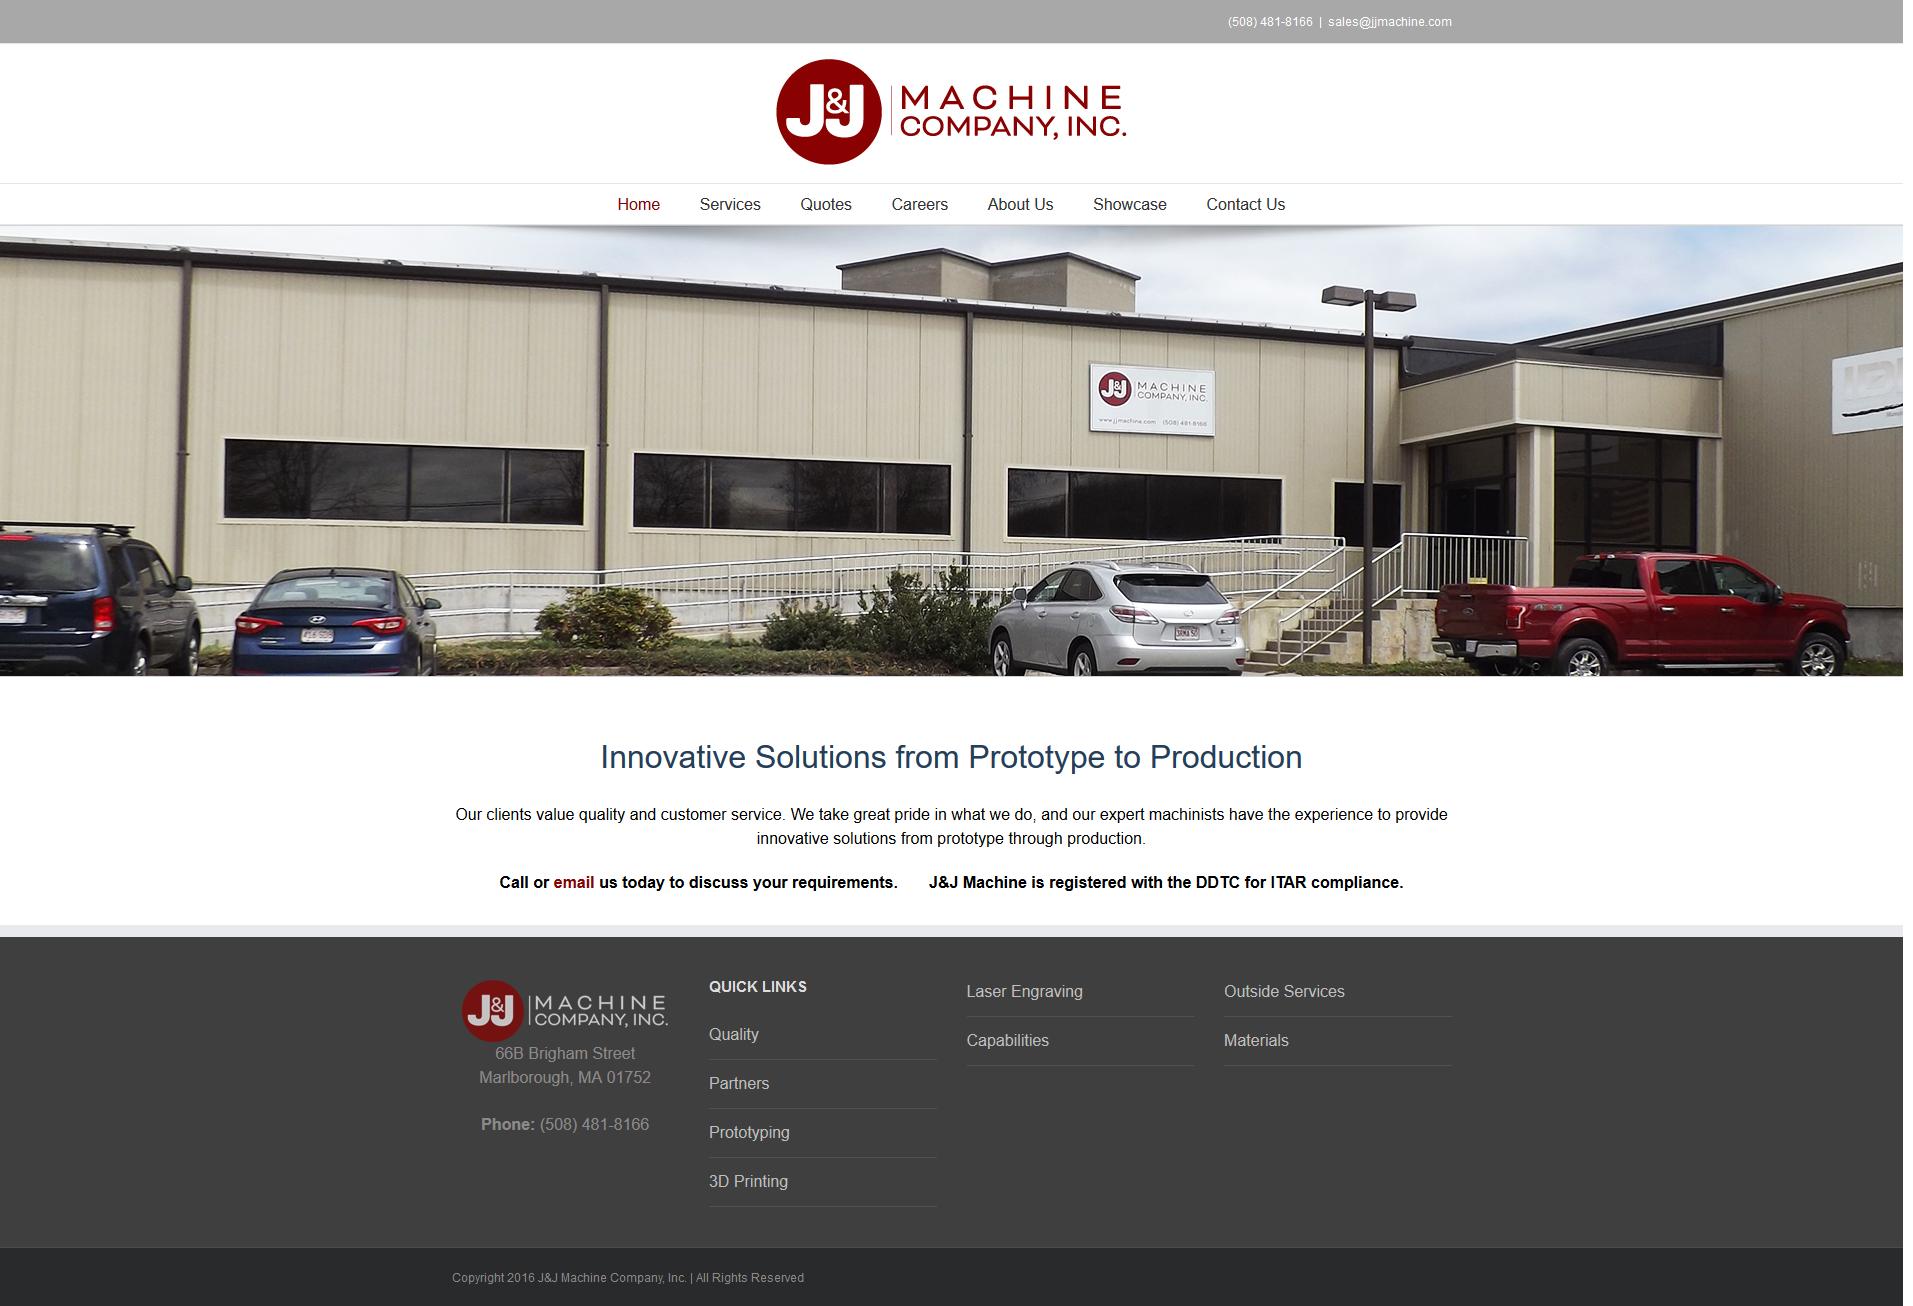 Prototyping and Production in Marlborough, Massachusetts - J&J Machine Company, Inc. 2016-05-23 08-21-03